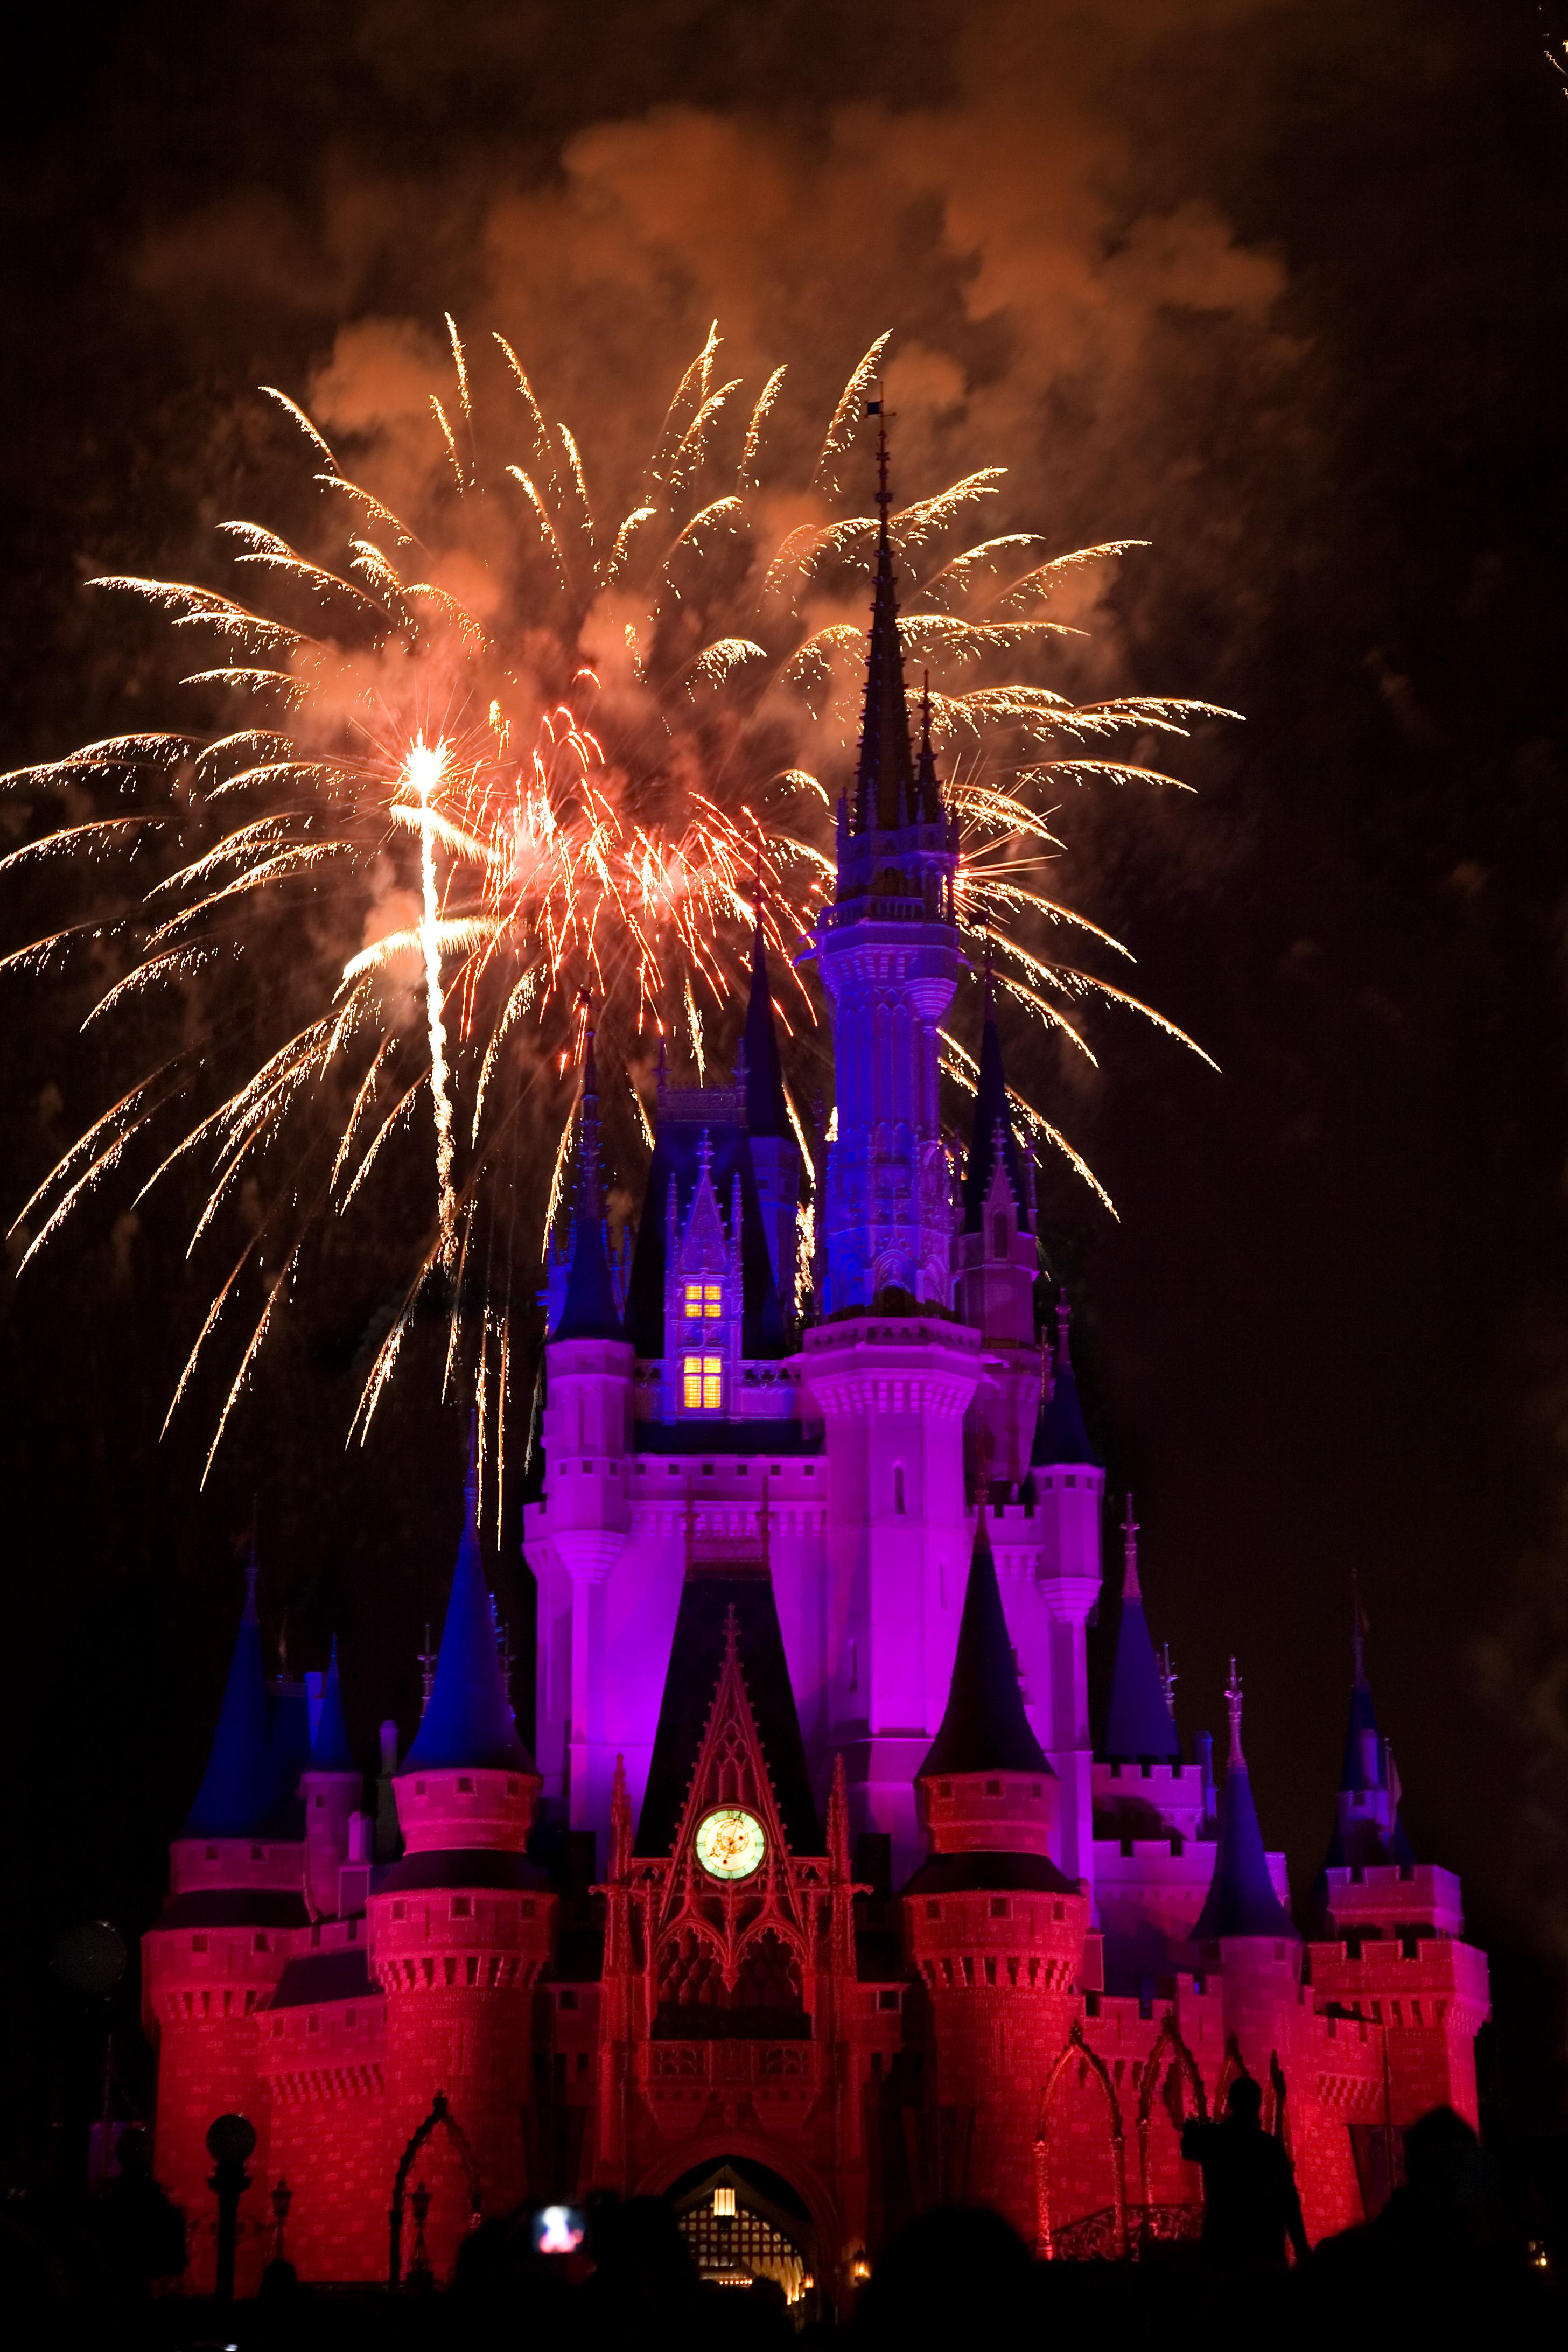 File:Disneyworld fireworks - 0207.jpg - Wikimedia Commons